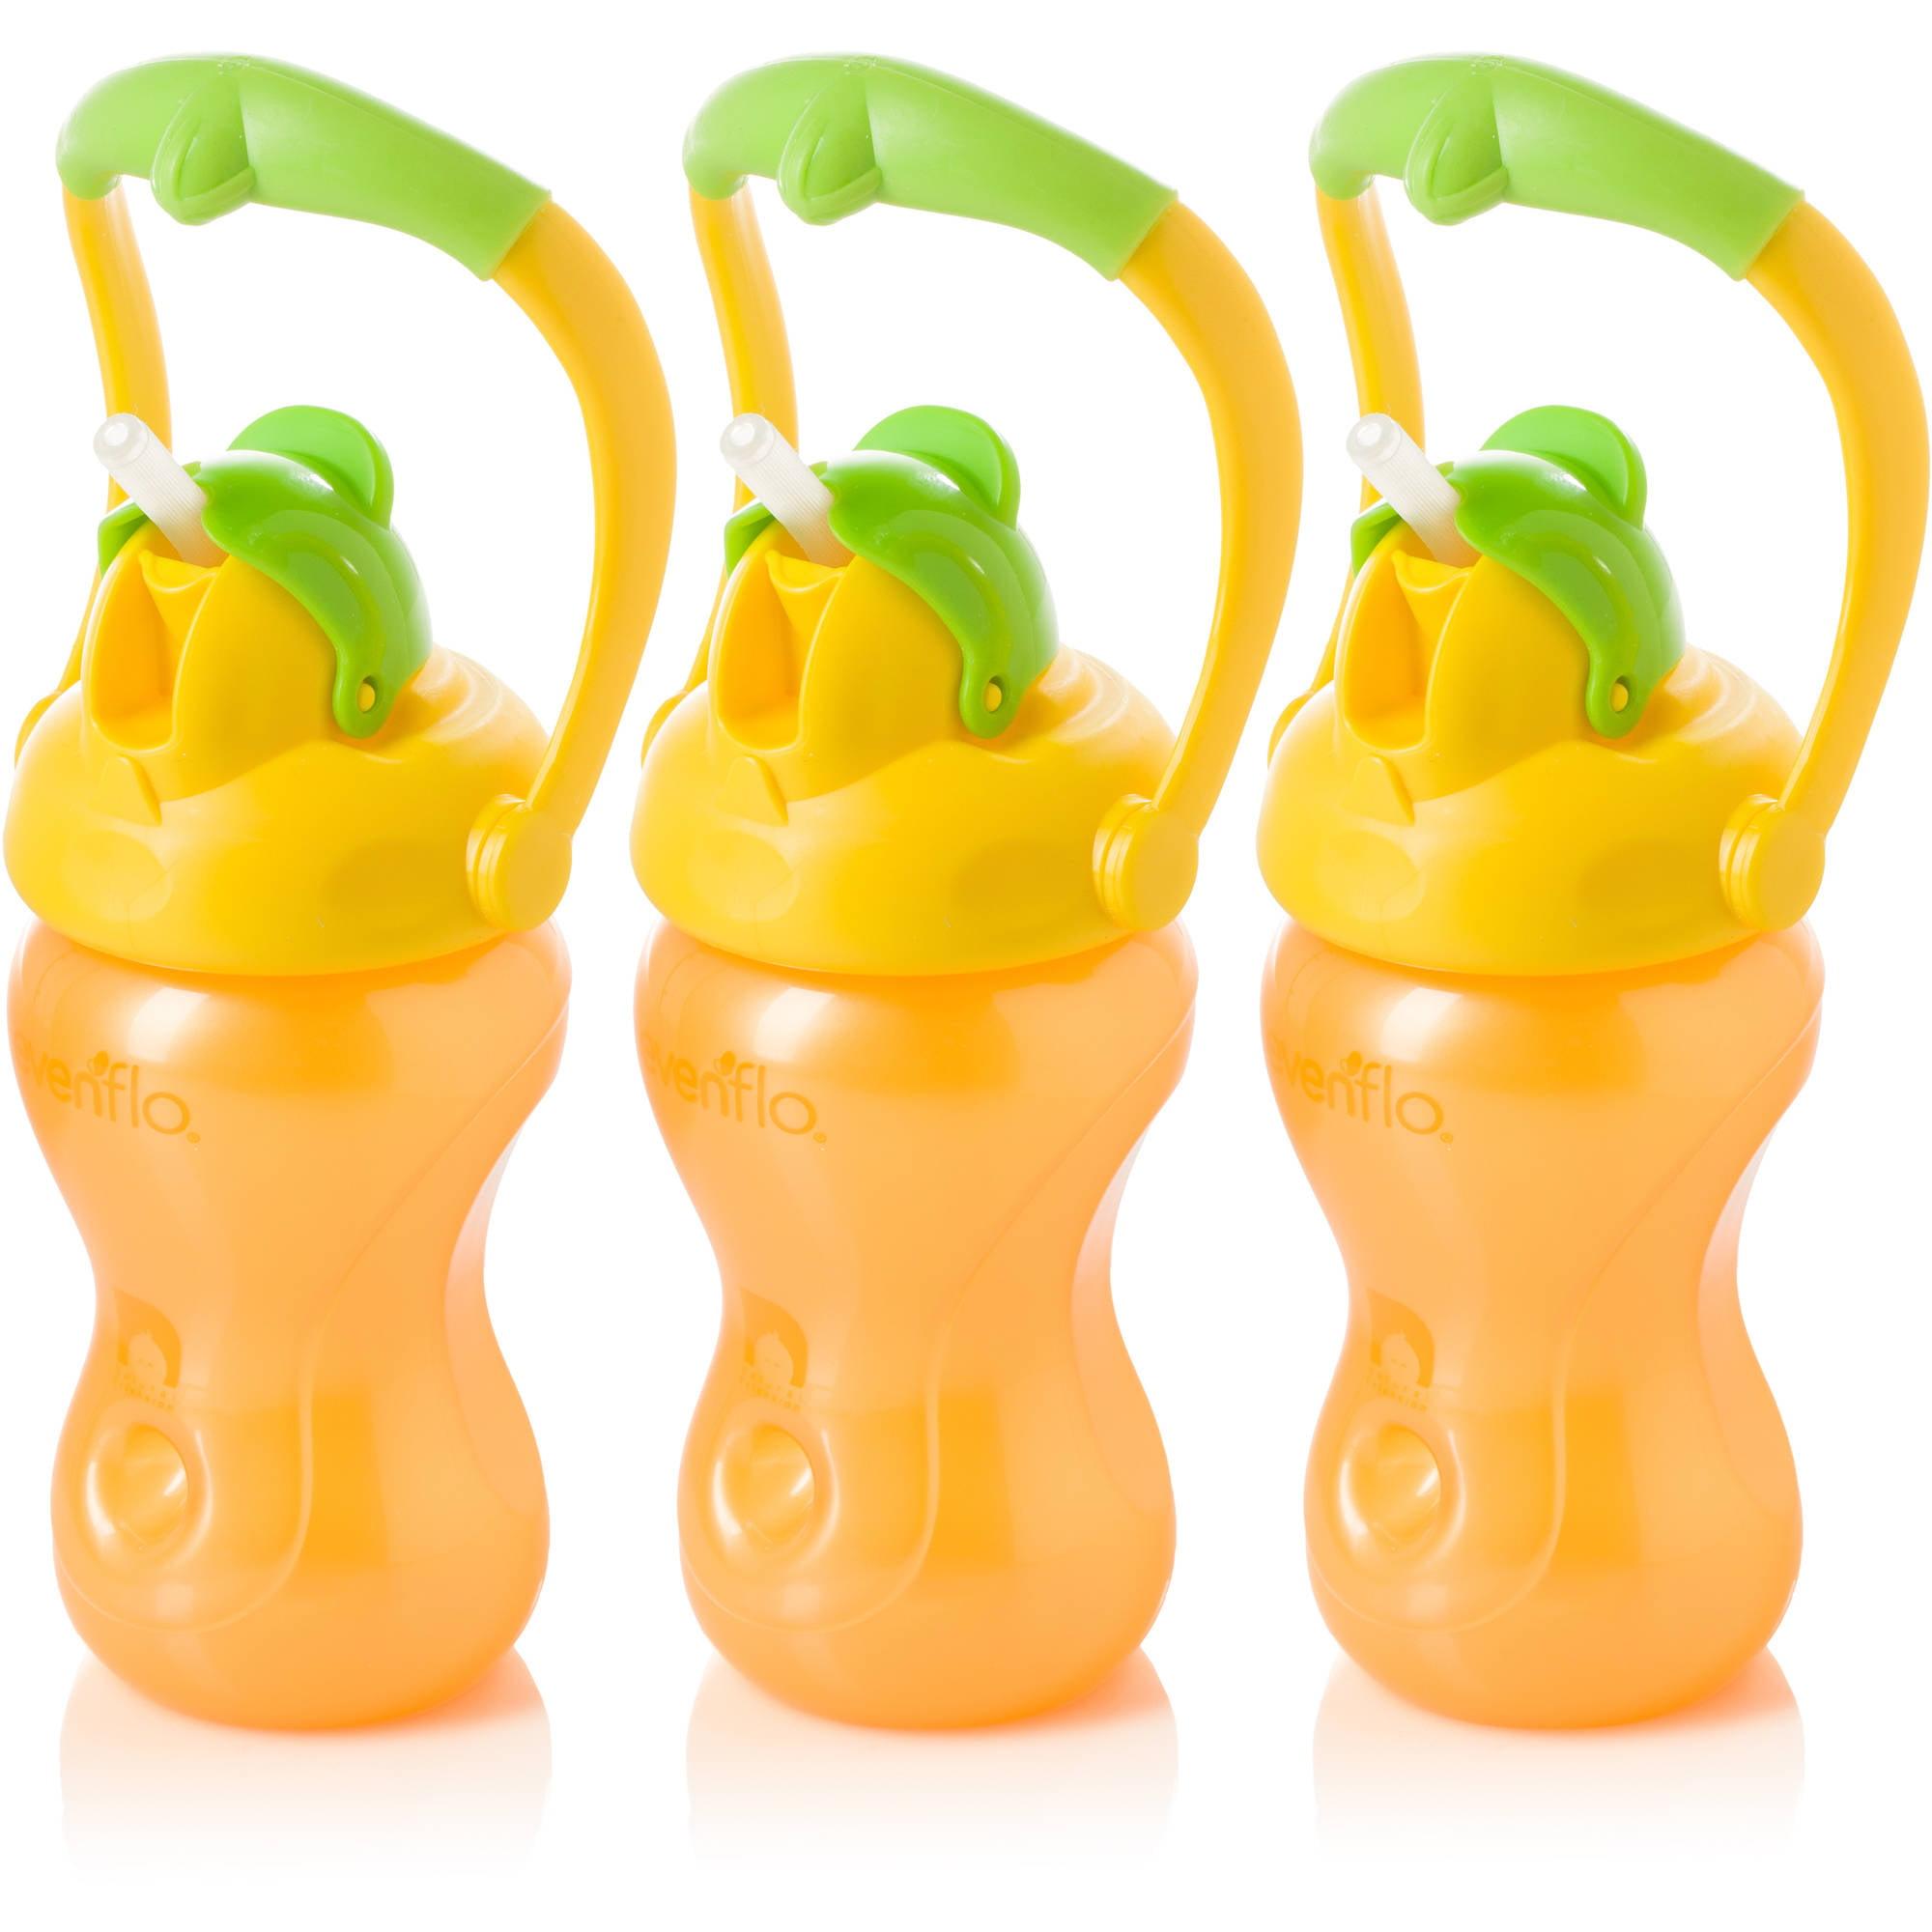 Evenflo Advanced 8oz Swing Handled Straw Cup, 3-Pack, Orange/Yellow Lid, BPA-Free